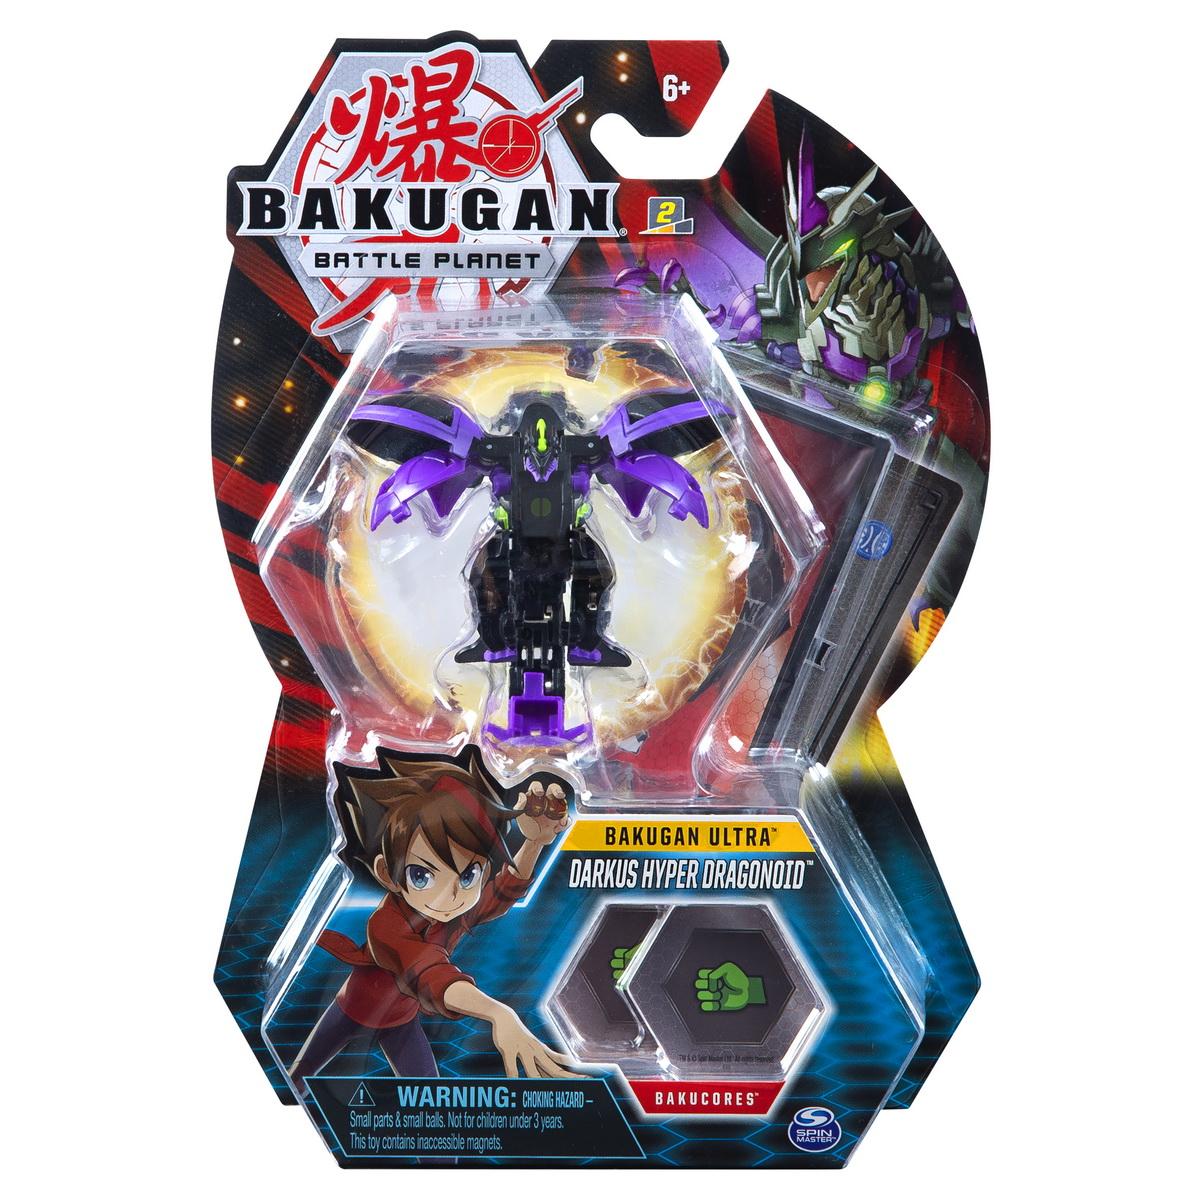 Bakugan Bila Ultra Darkus Hyper Dragonoid